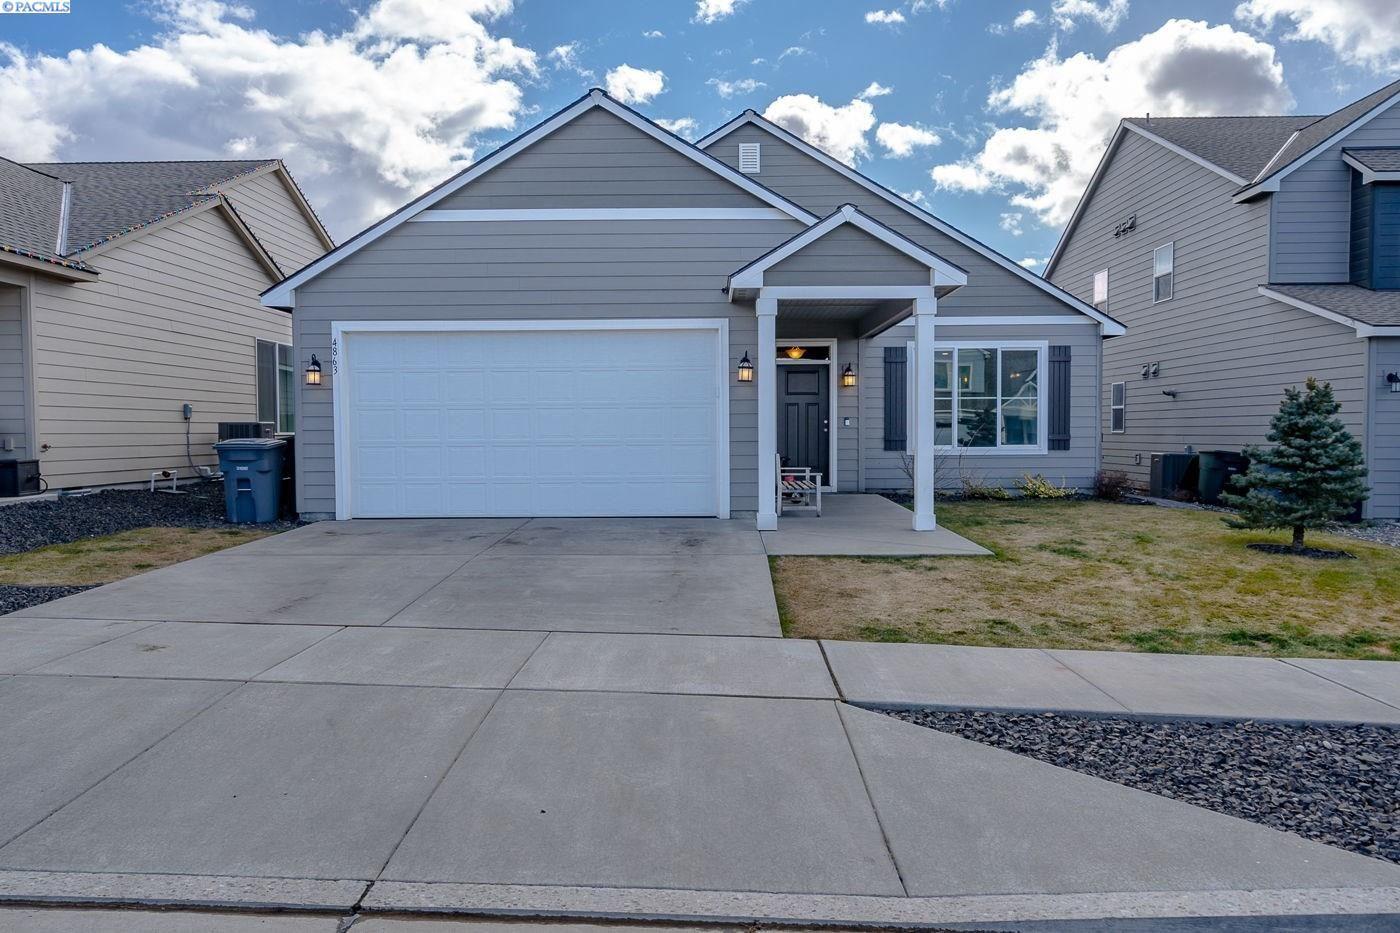 Photo of 4863 Corvina St., Richland, WA 99352 (MLS # 251944)